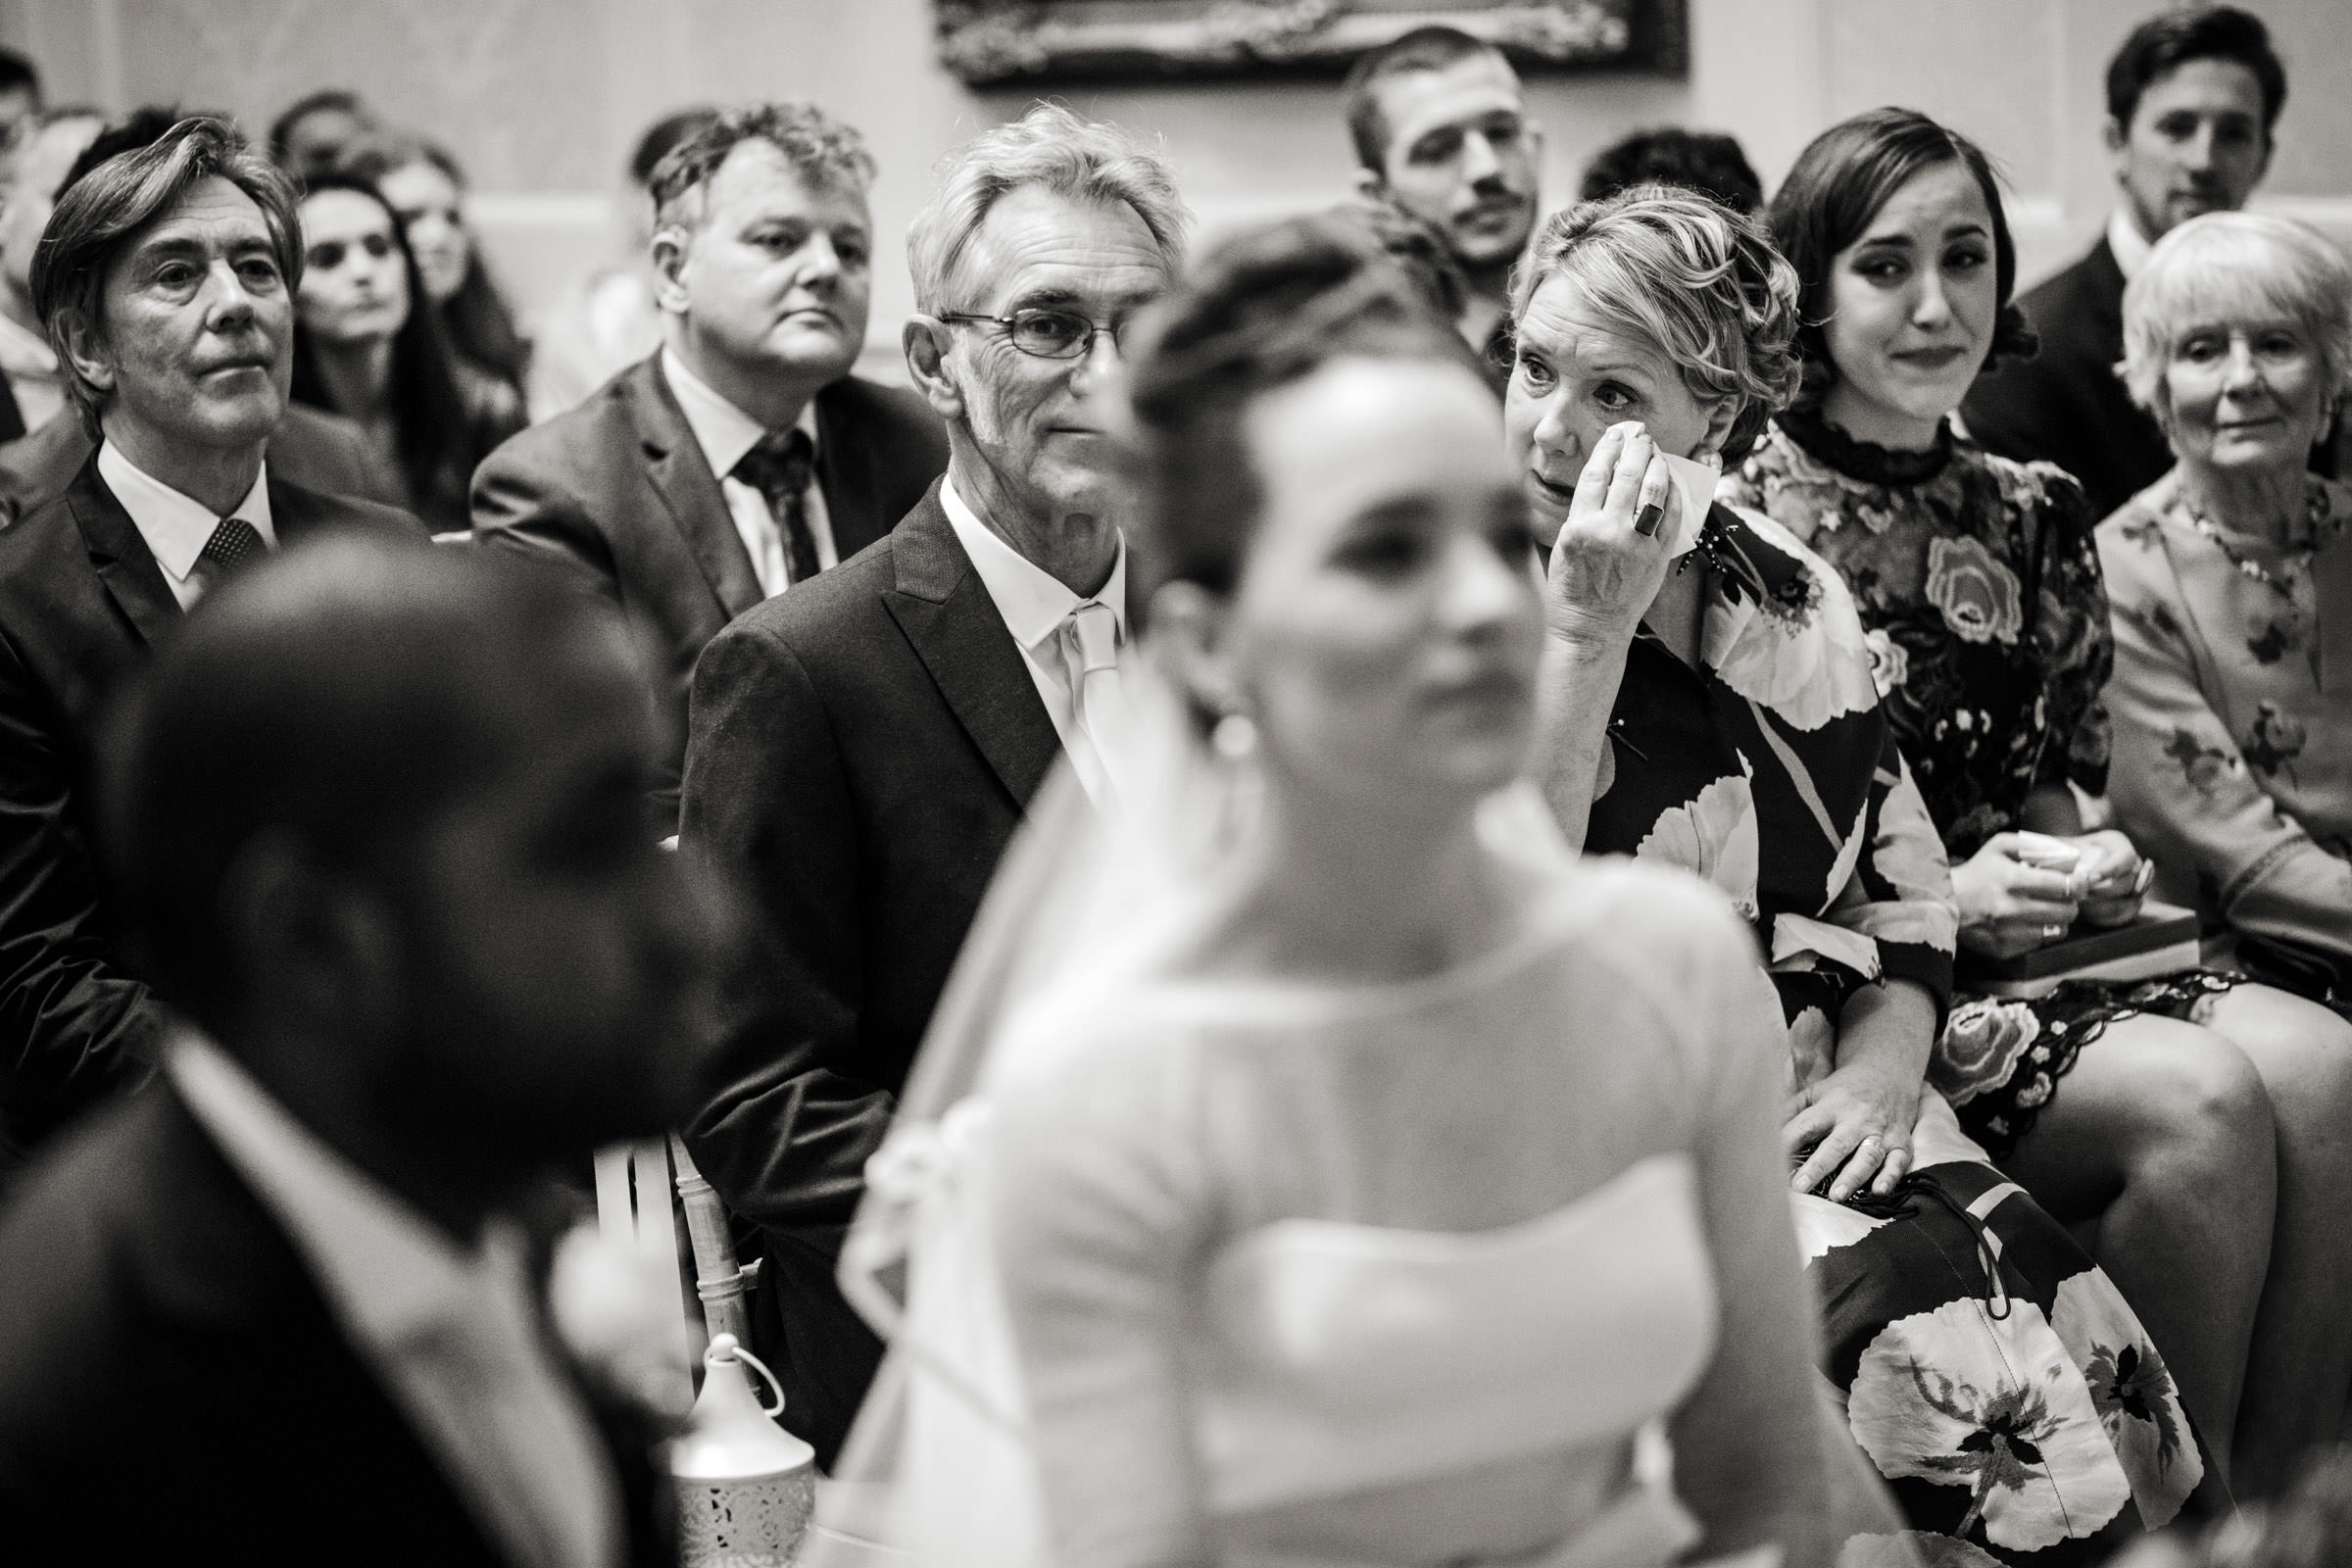 Hedsor House and Park Wedding Photographs 019.jpg